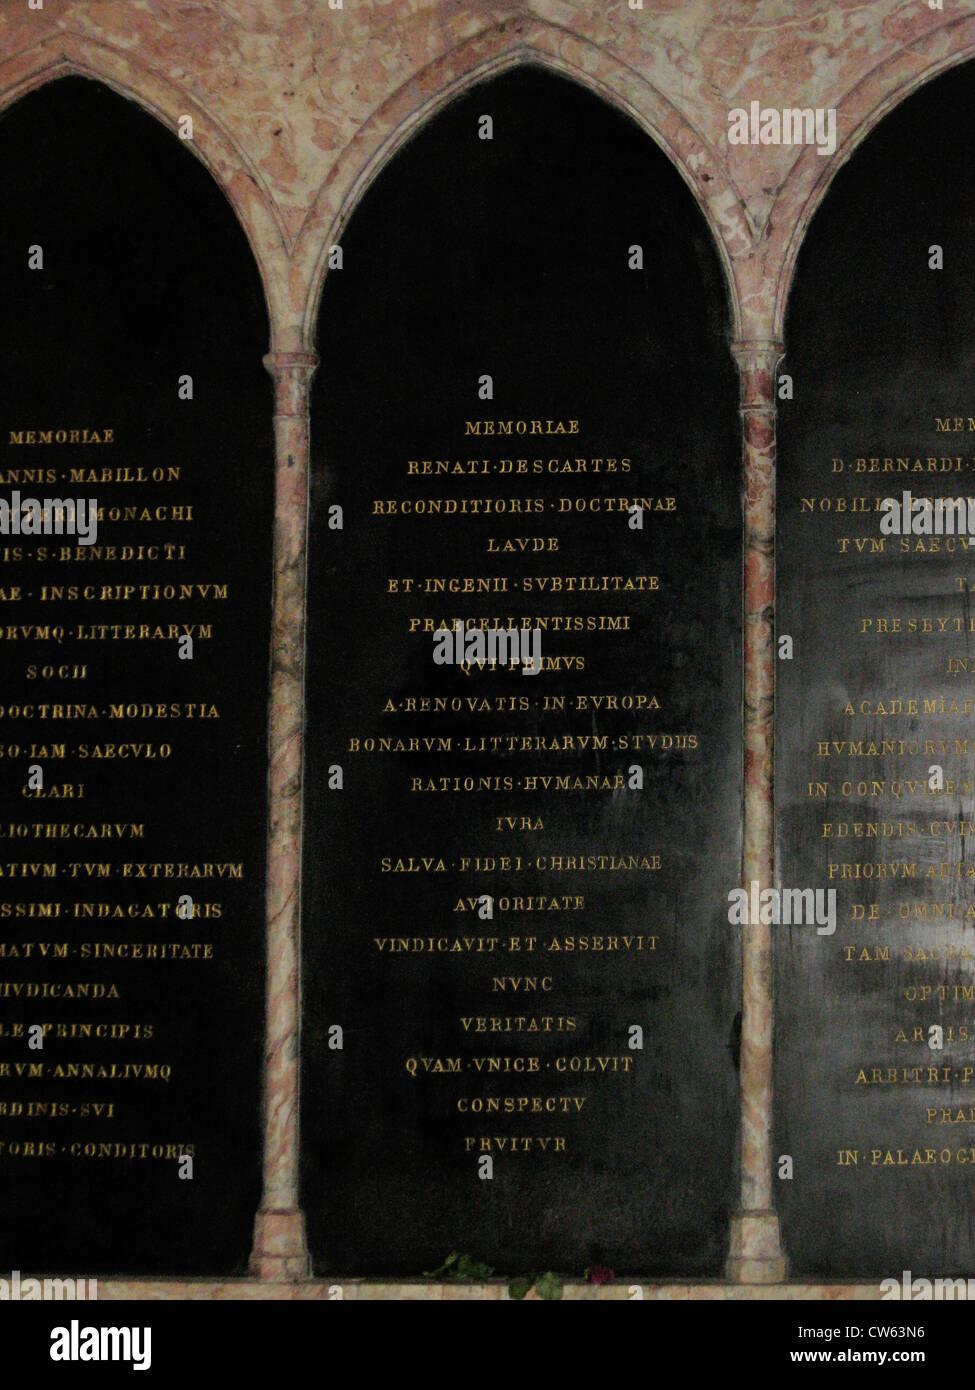 Funerary plate of René Descartes - Stock Image